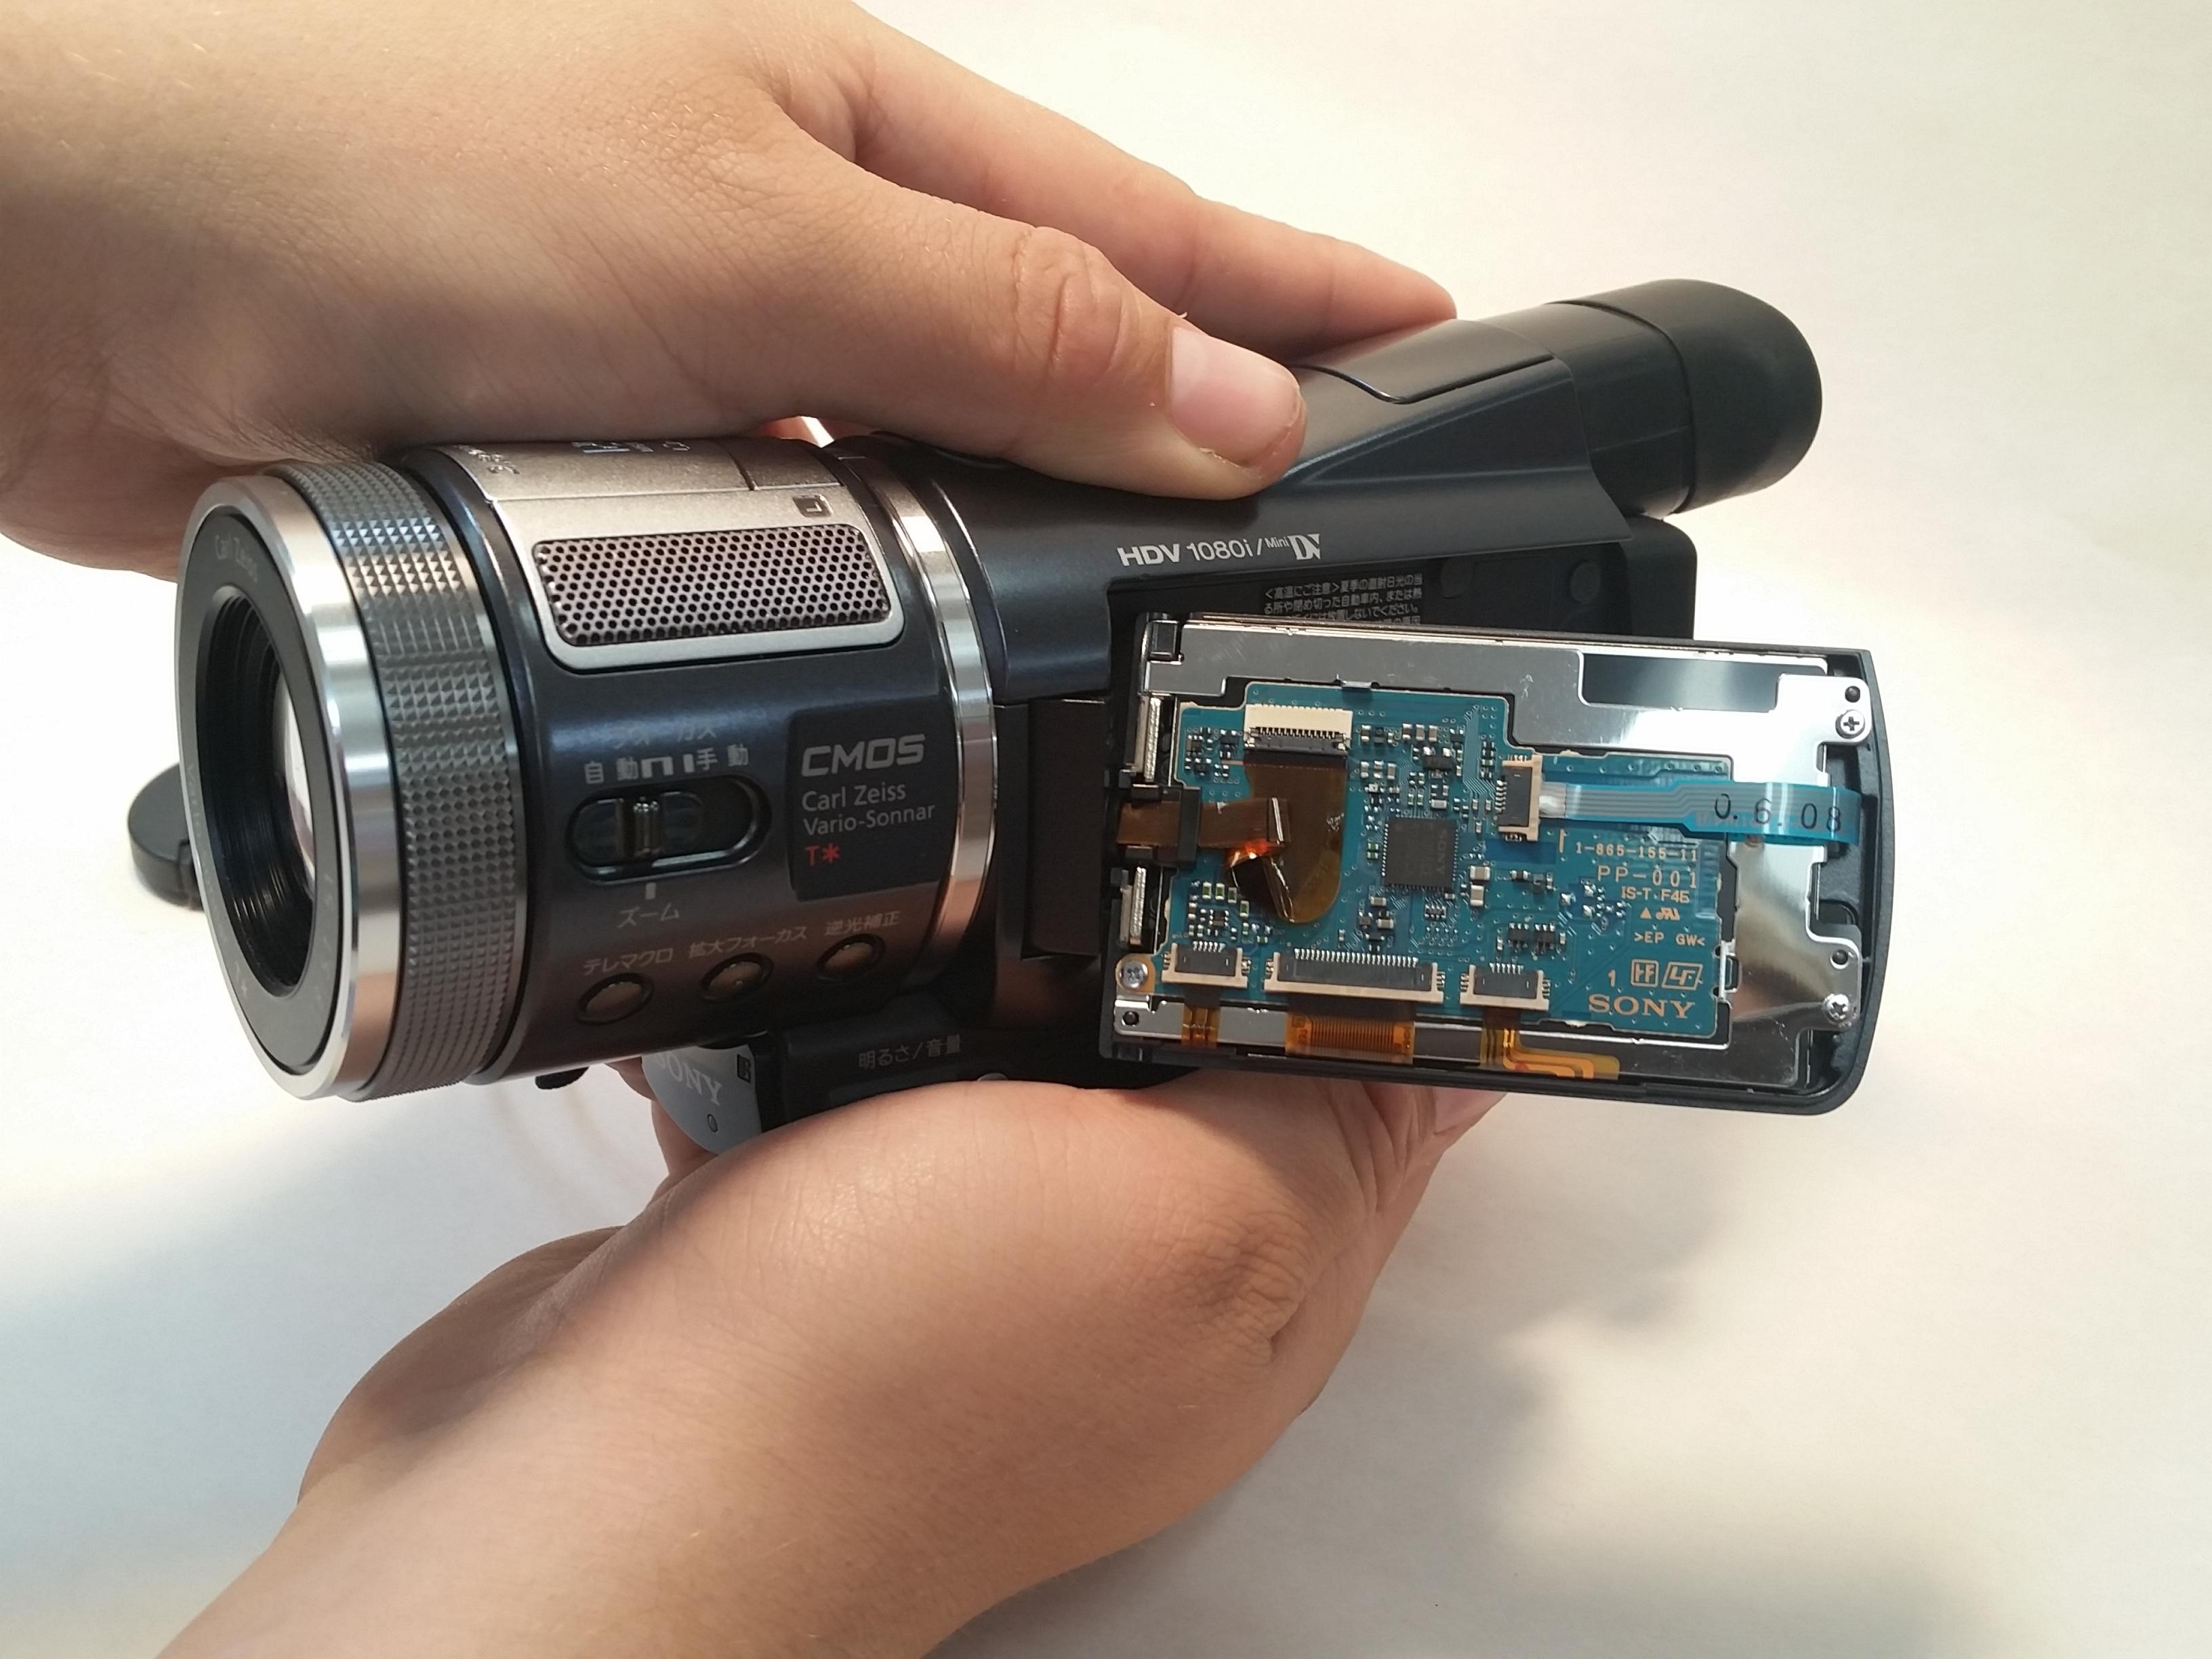 Sony Camcorder Repair Ifixit Hdr Pj810 Full Hd Handycam Lcd